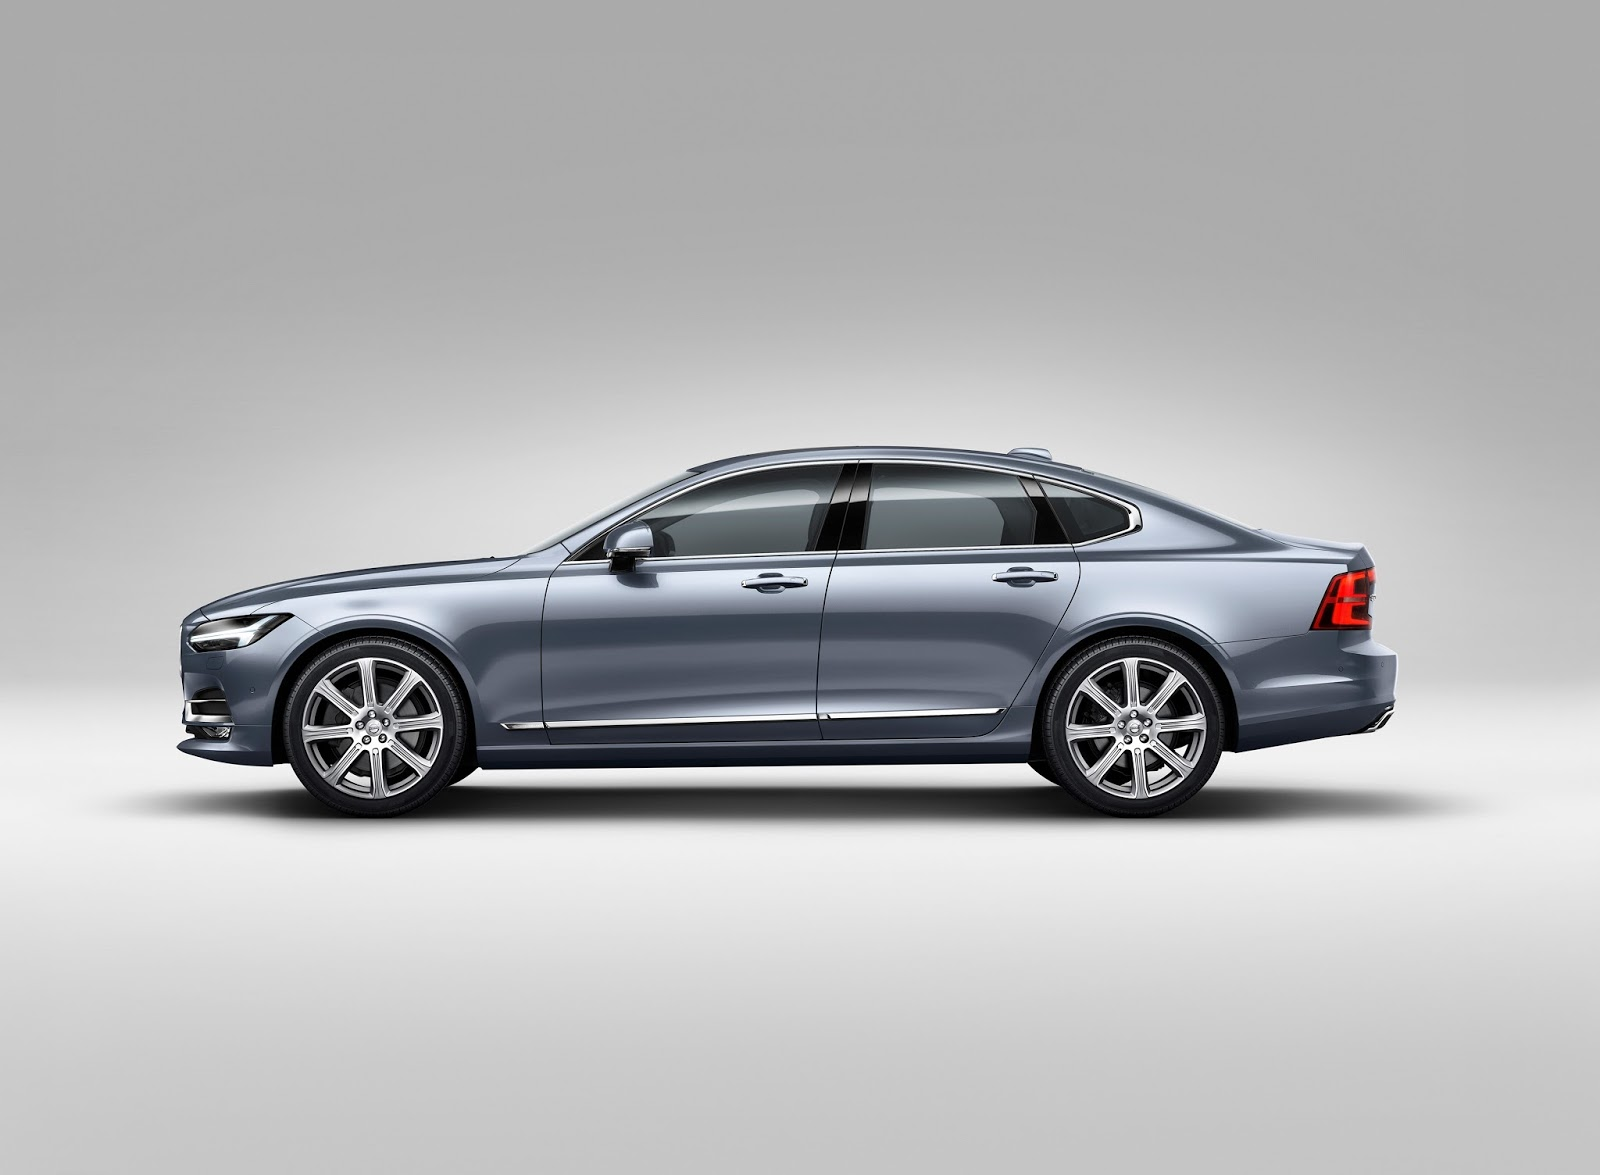 170085 Profile Volvo S90 Mussel Blue Το νέο Volvo S90 έρχεται και βάζει φωτιά στον ανταγωνισμό premium sedan, Volvo, Volvo Cars, Volvo S90